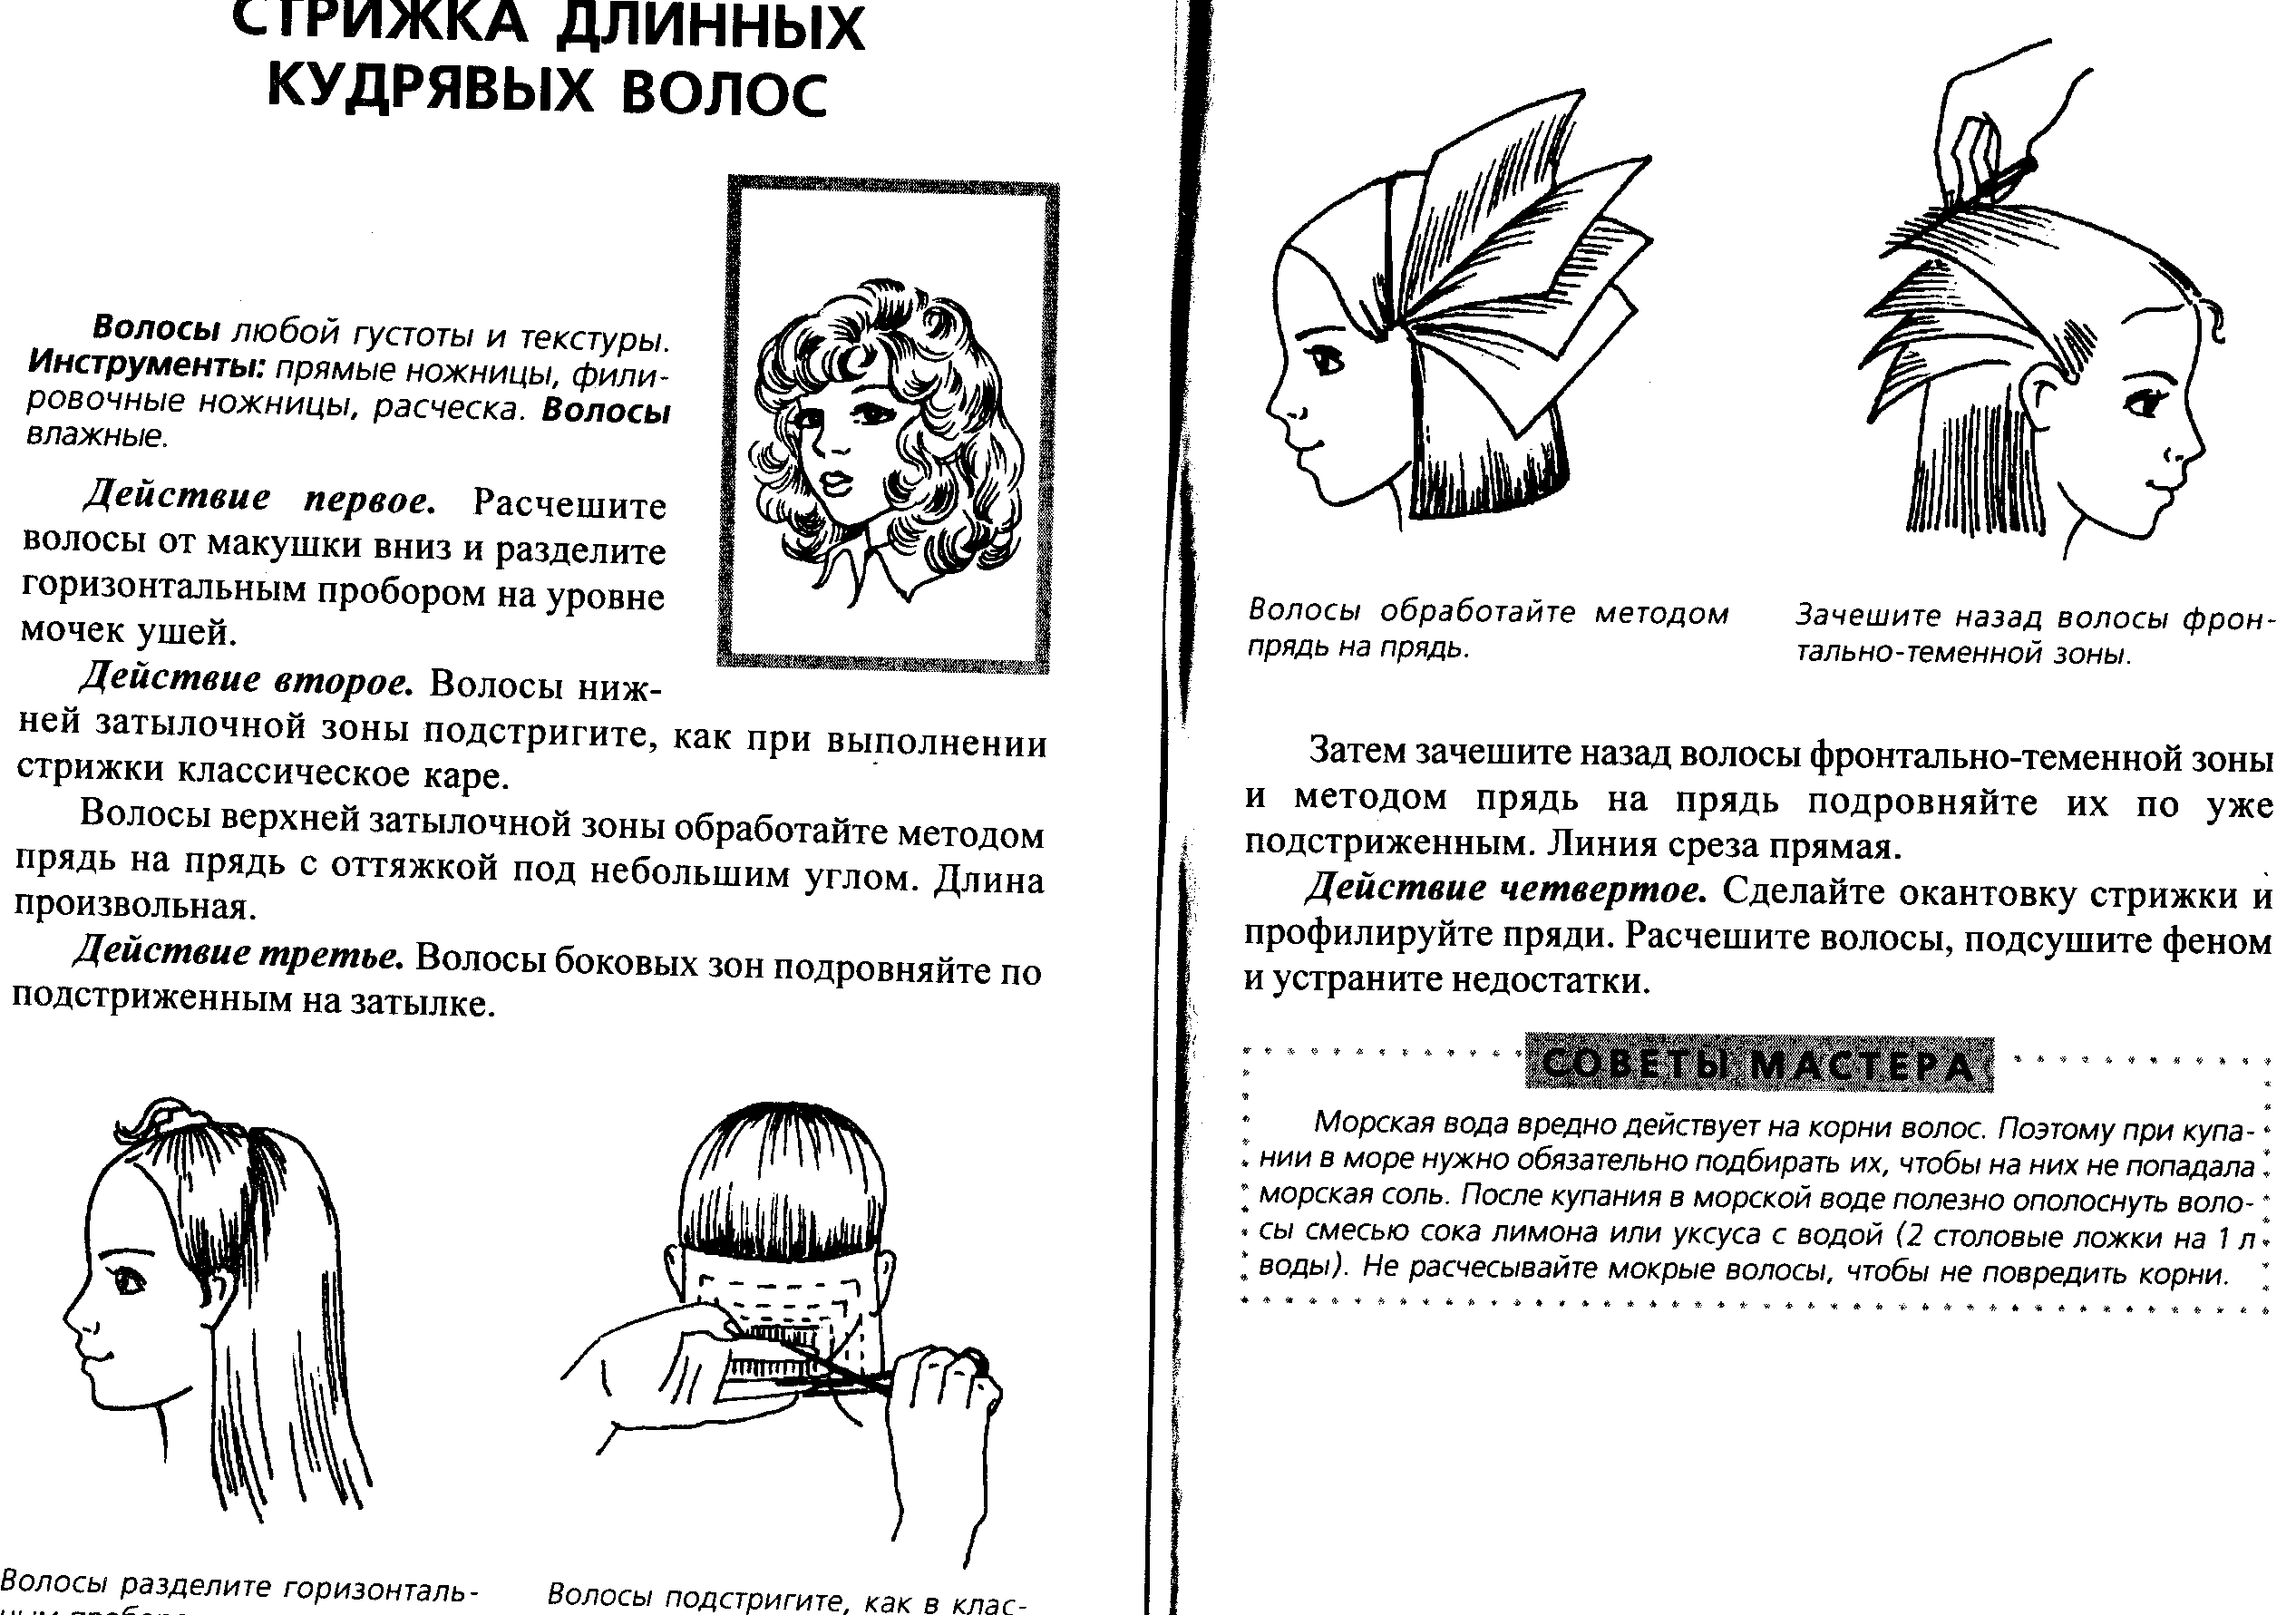 D:\Documents and Settings\Admin\Мои документы\Мои рисунки\MP Navigator EX\2013_04_15\IMG_0002.bmp